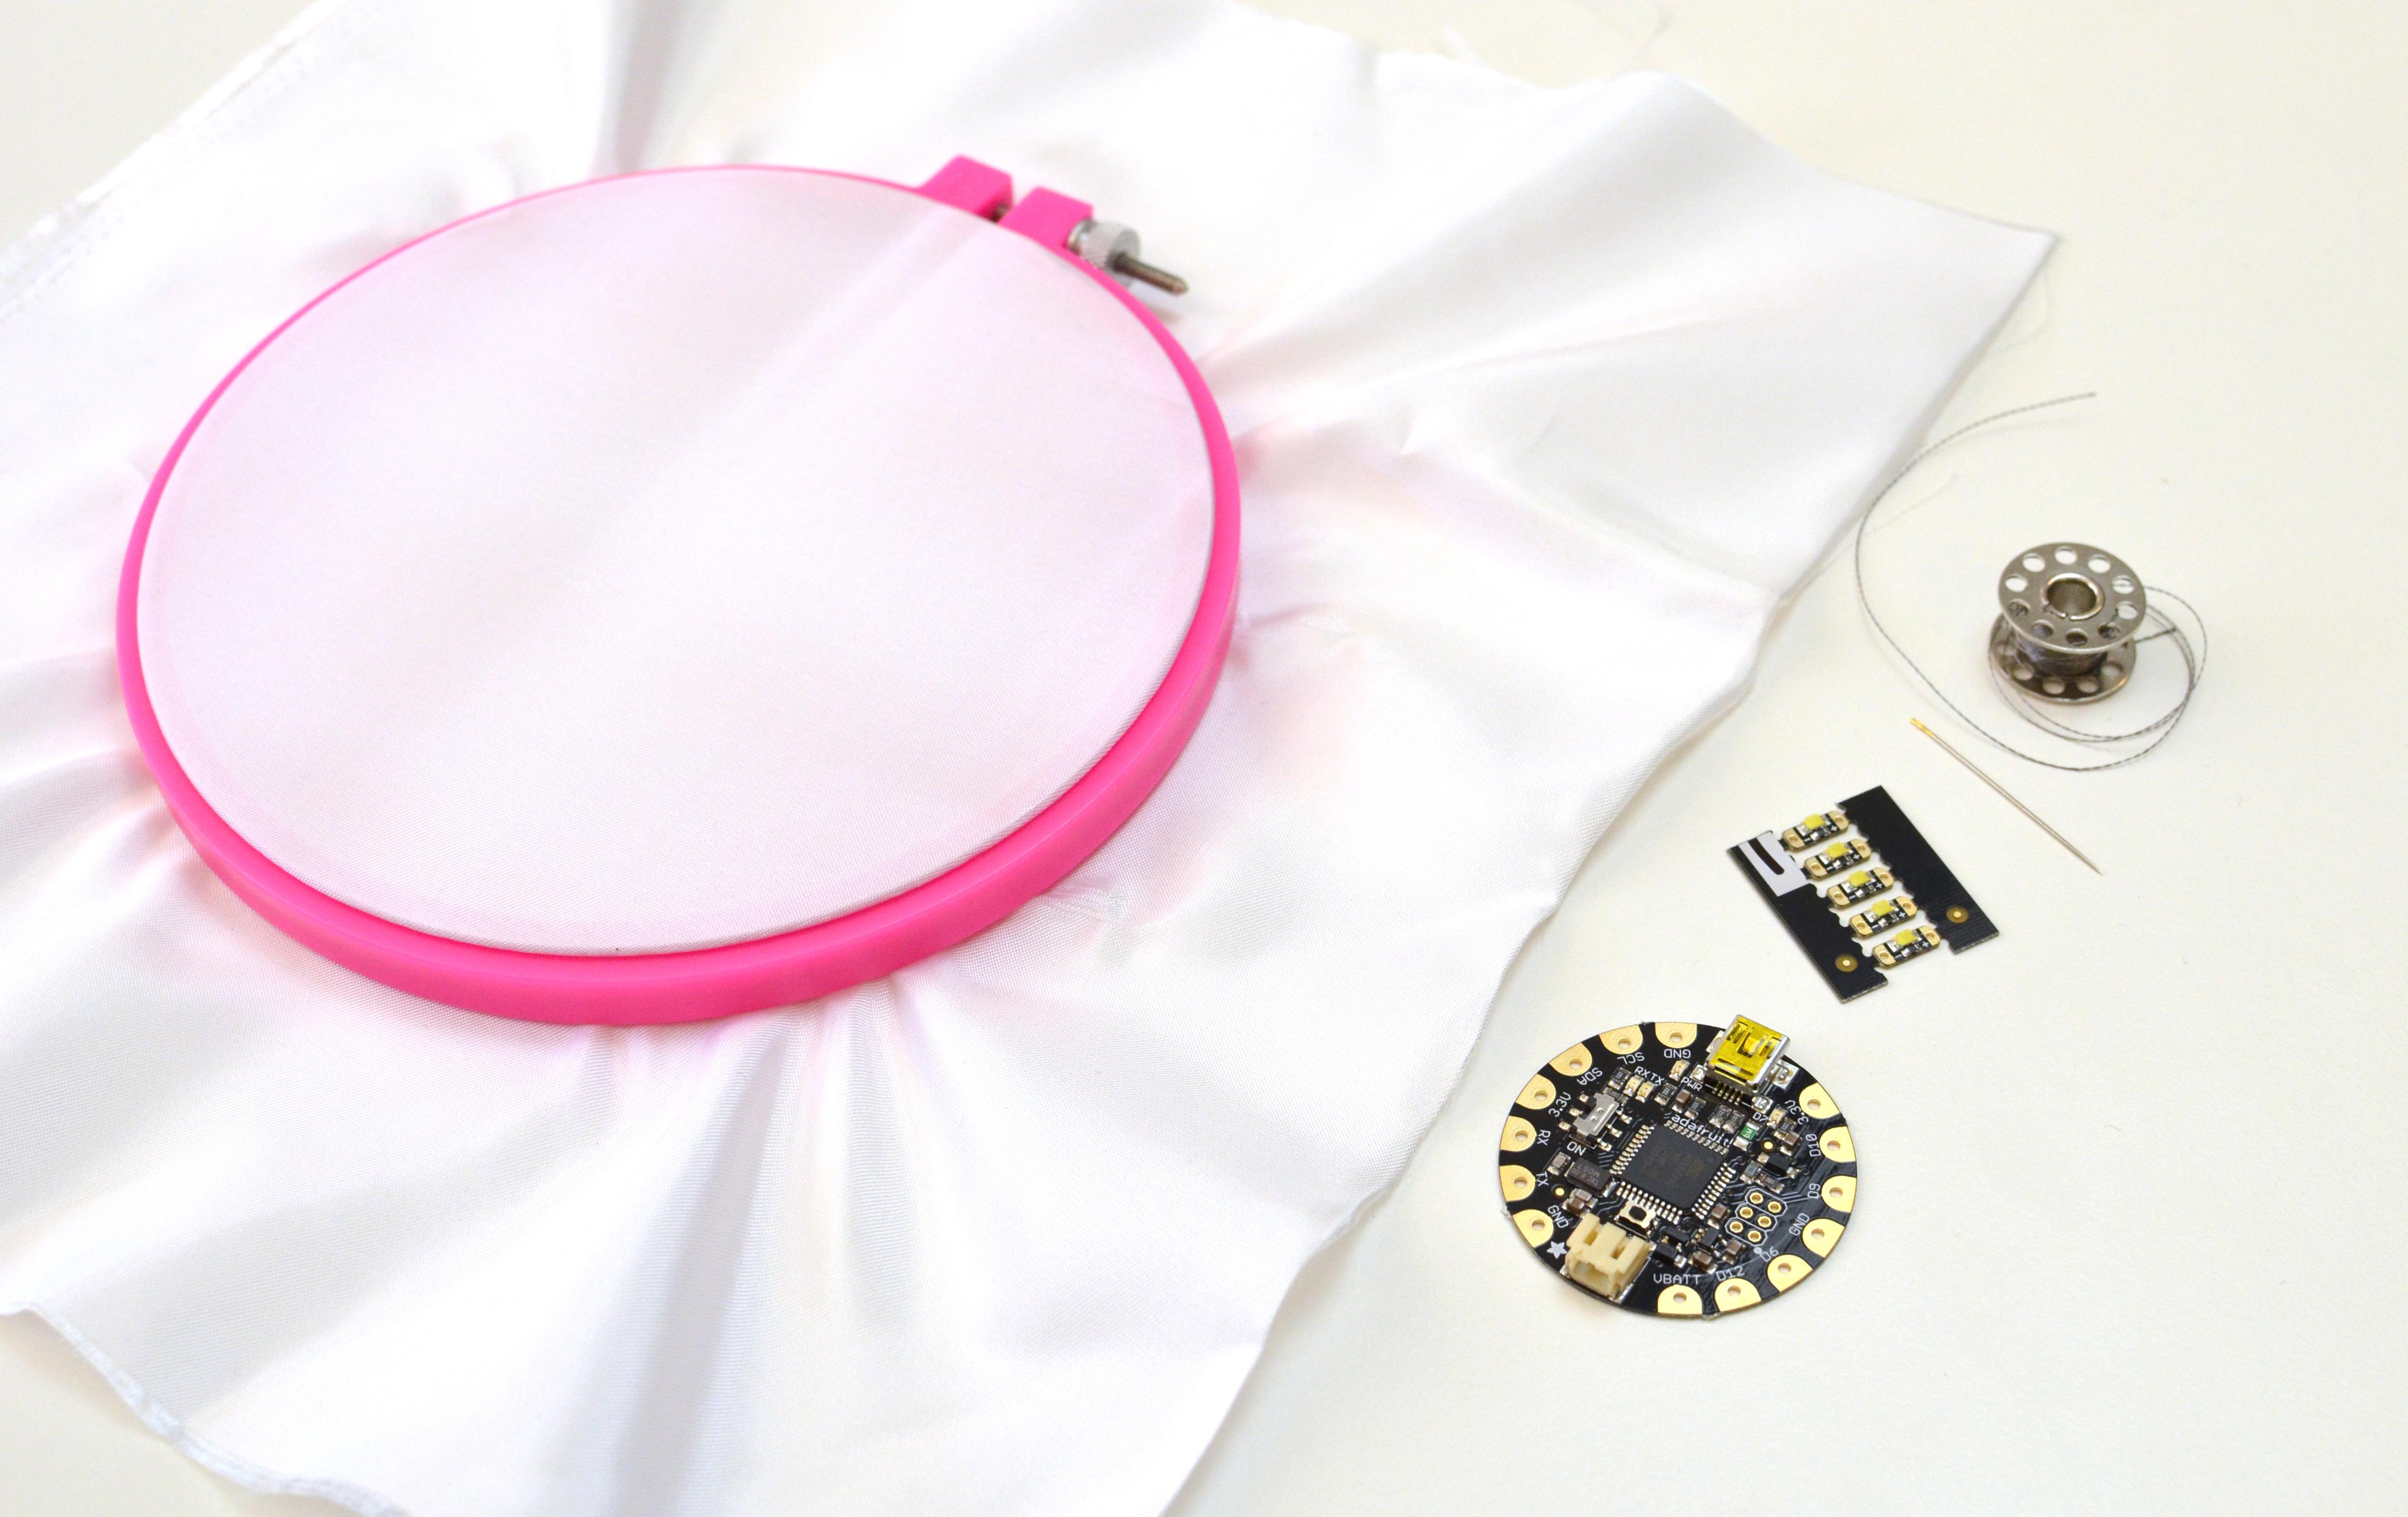 leds_stitching-sequins-00.jpg